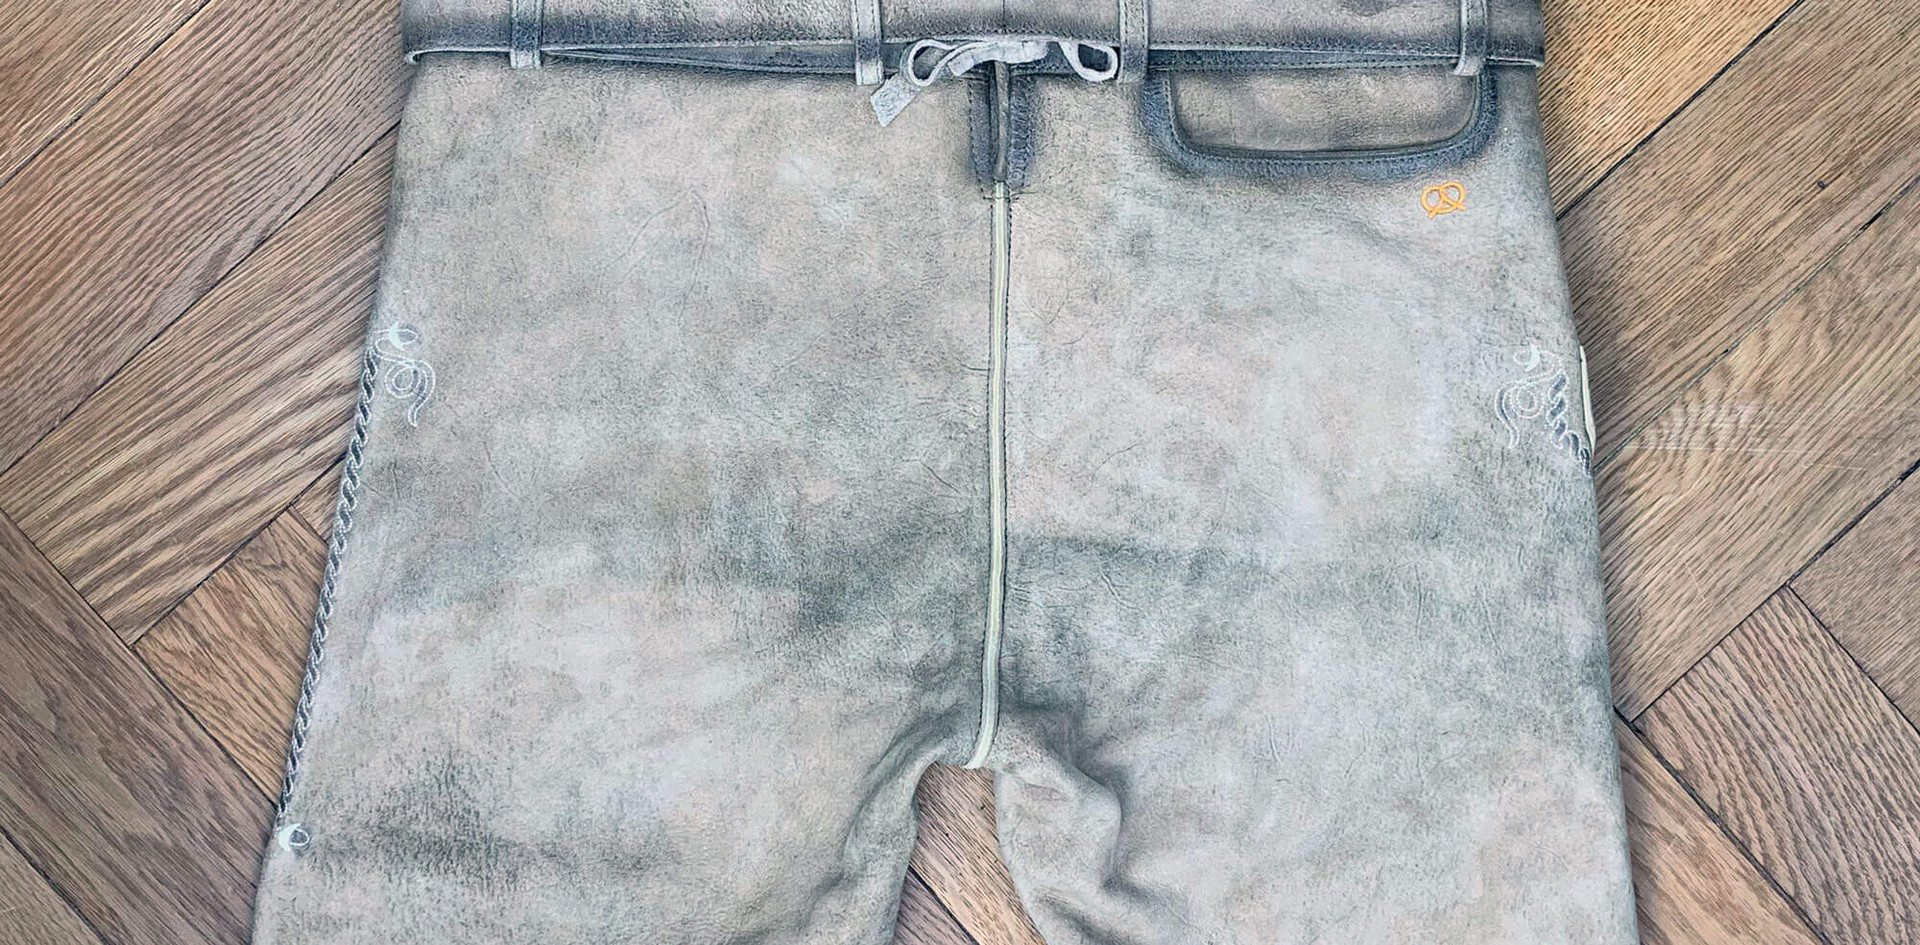 Lederhose Light - back